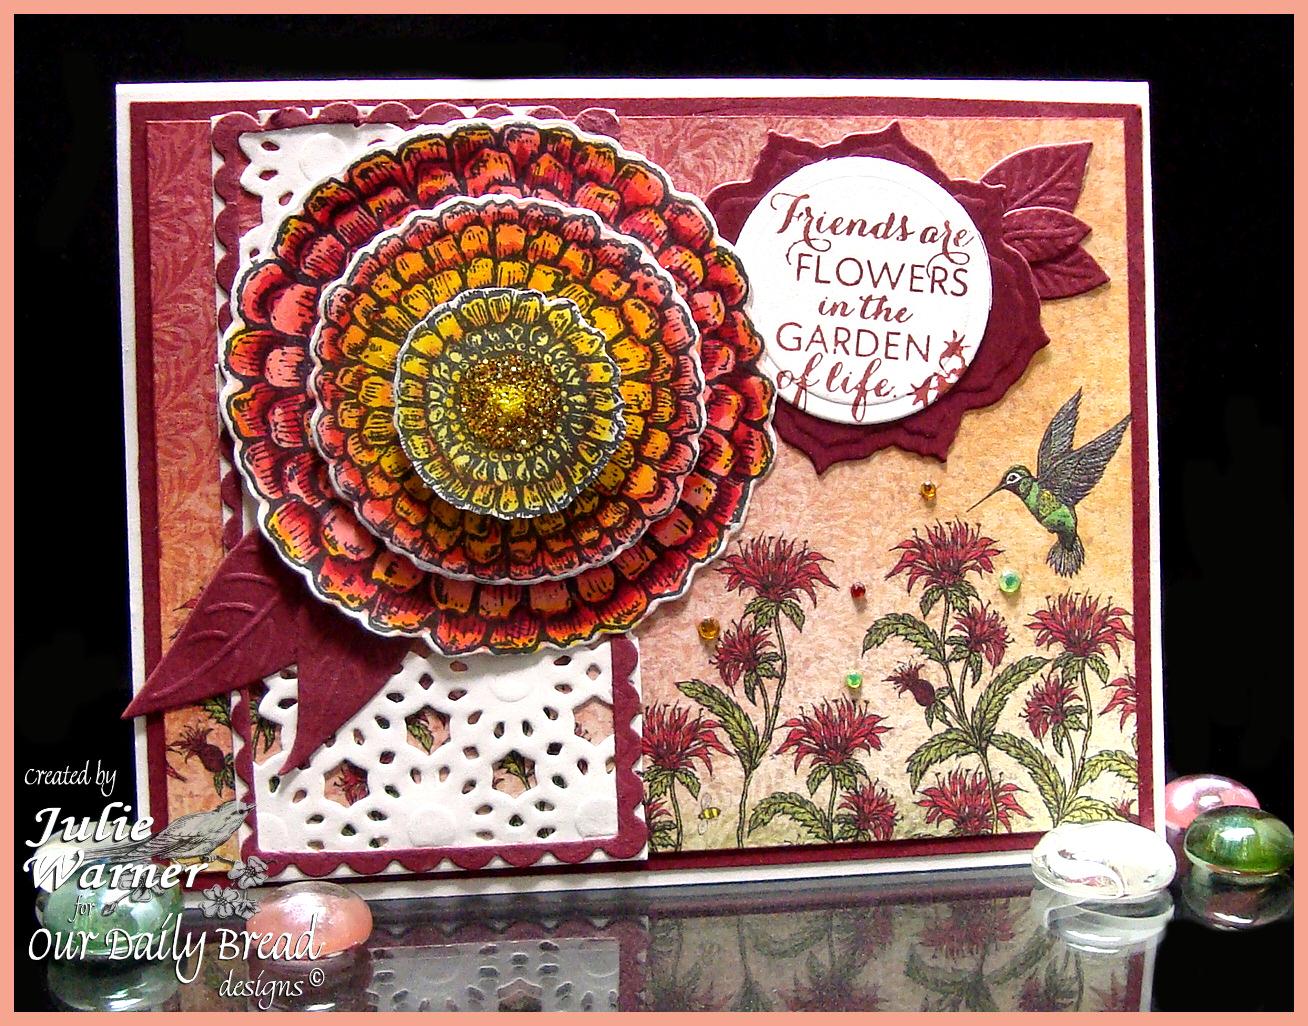 Stamps - Zinnia, ODBD Blooming Garden Paper Collection, ODBD Custom Zinnia and Leaves Die,ODBD Custom Daisy Chain Die,ODBD Custom Fancy Foliage Die